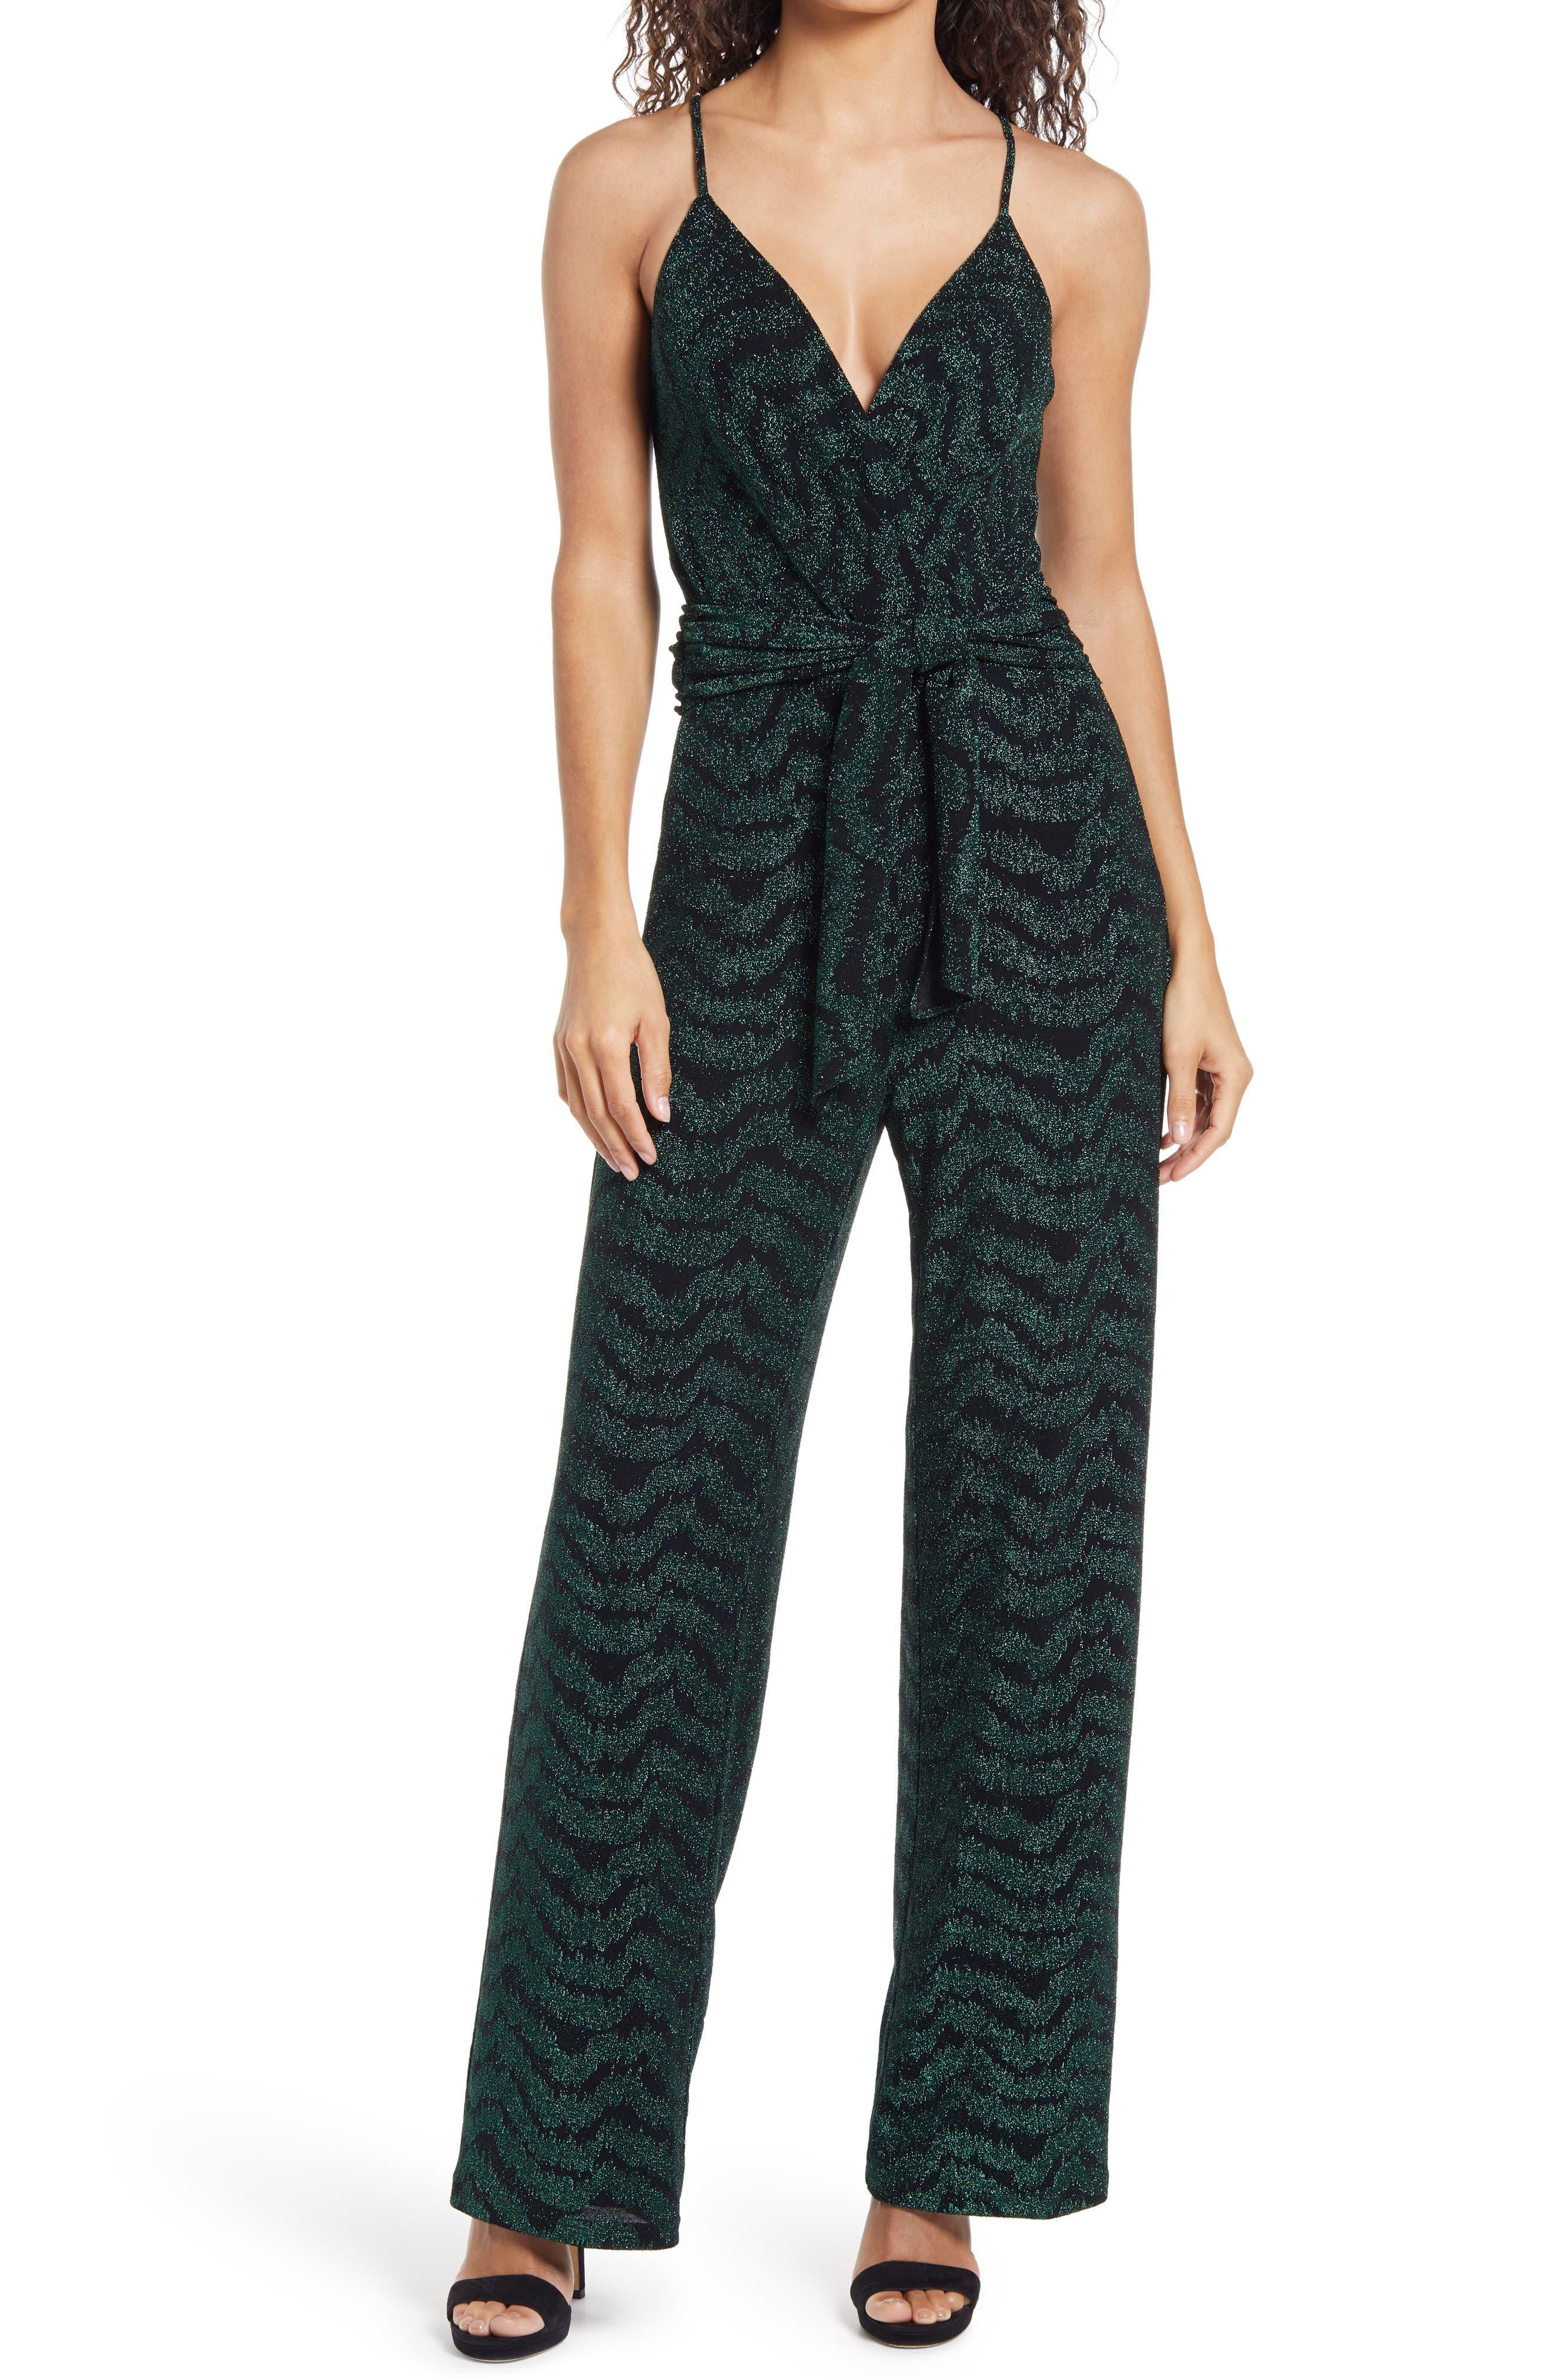 Image of Saylor Ediola Jacquard Sleeveless Jumpsuit